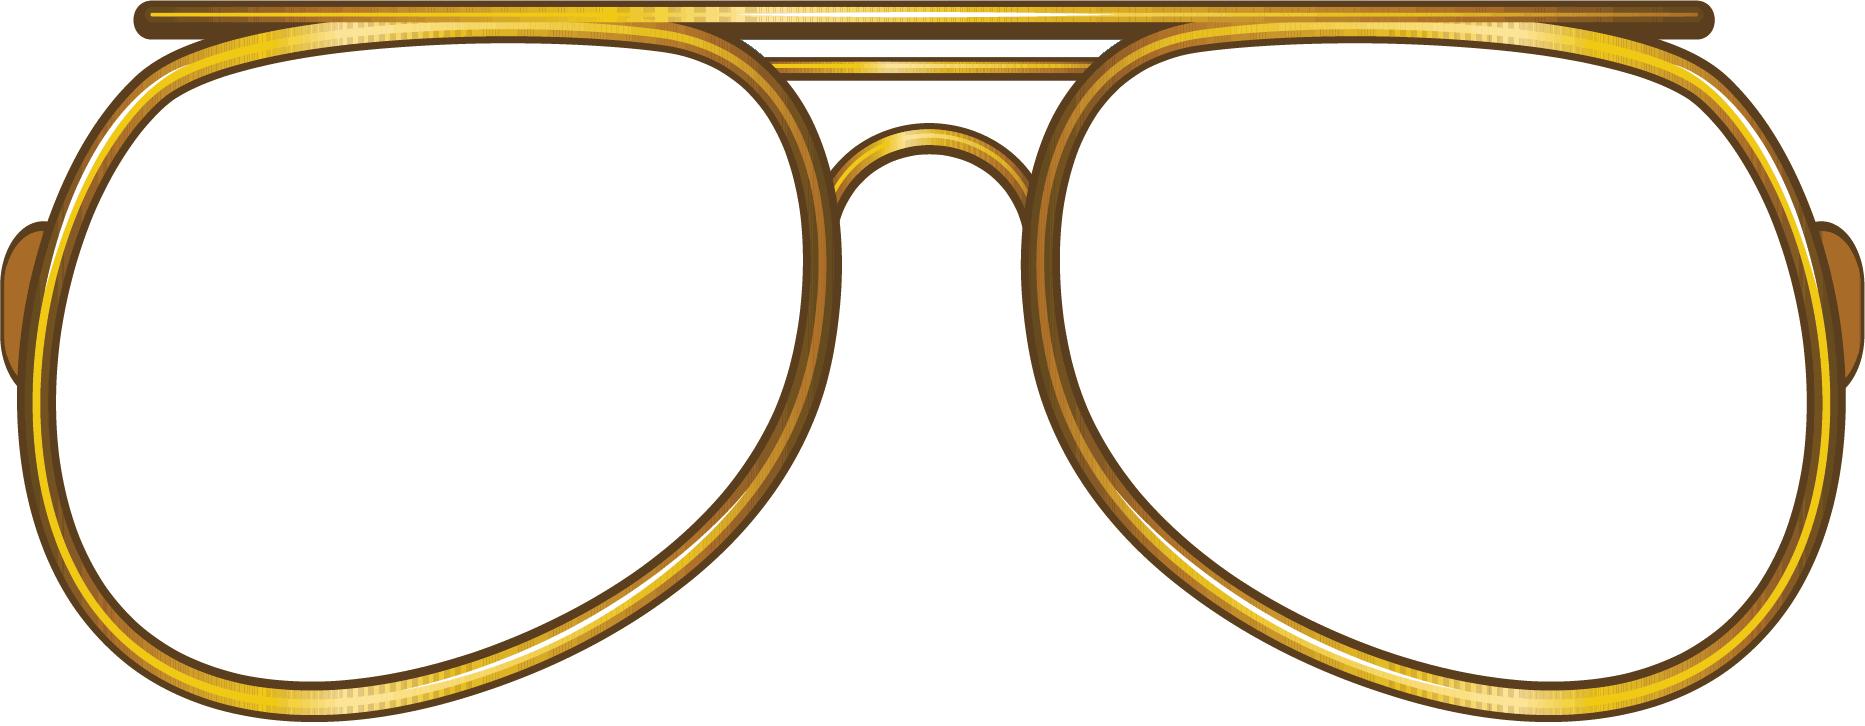 1865x726 Sunglasses Clip Art Free Clipart Images